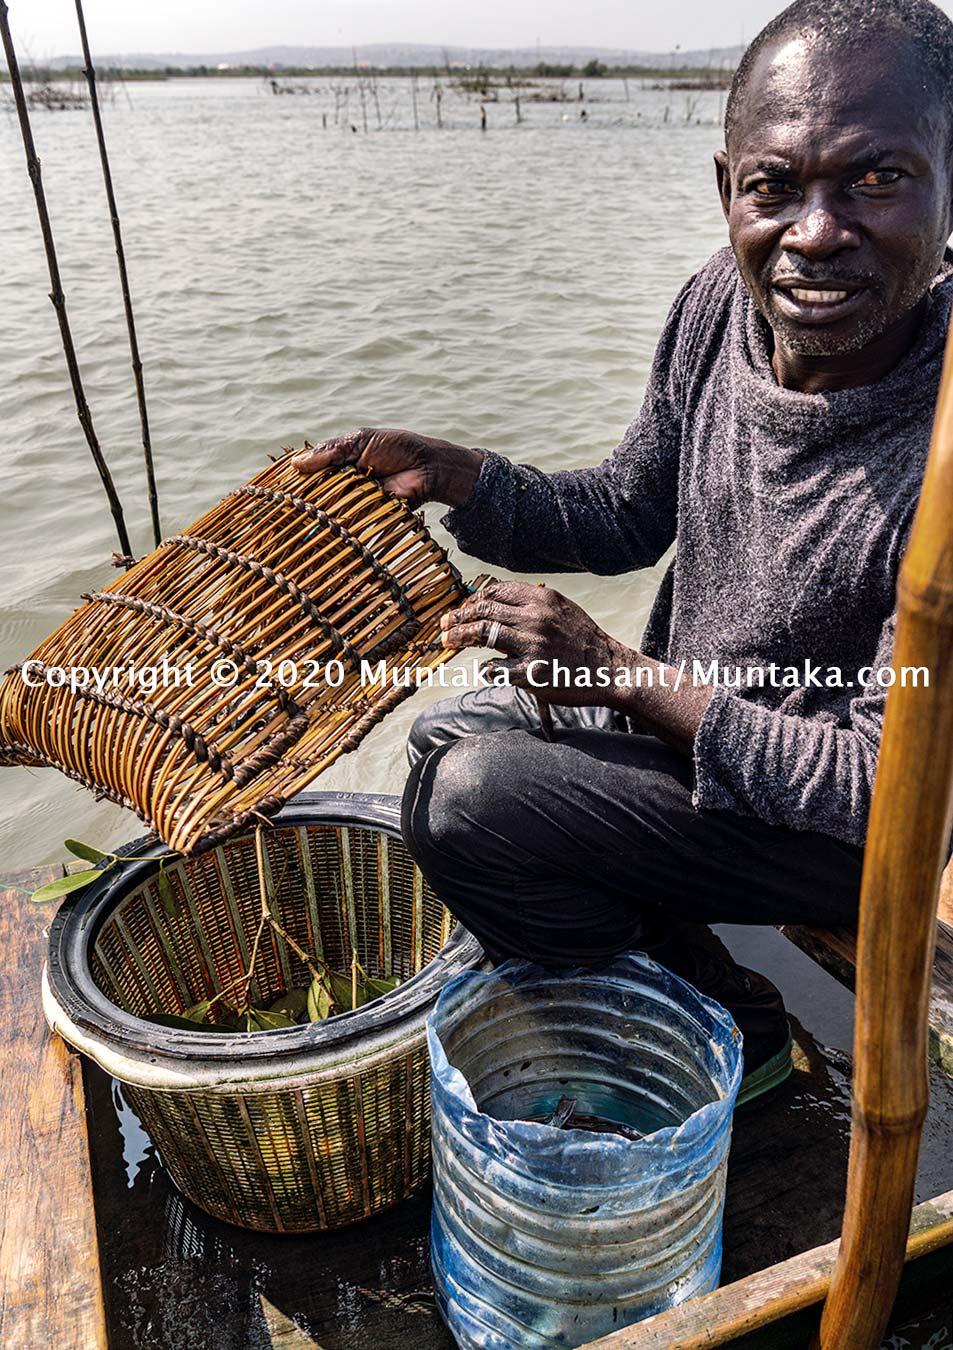 Blue crab fisherman in Ghana. Copyright © 2020 Muntaka Chasant